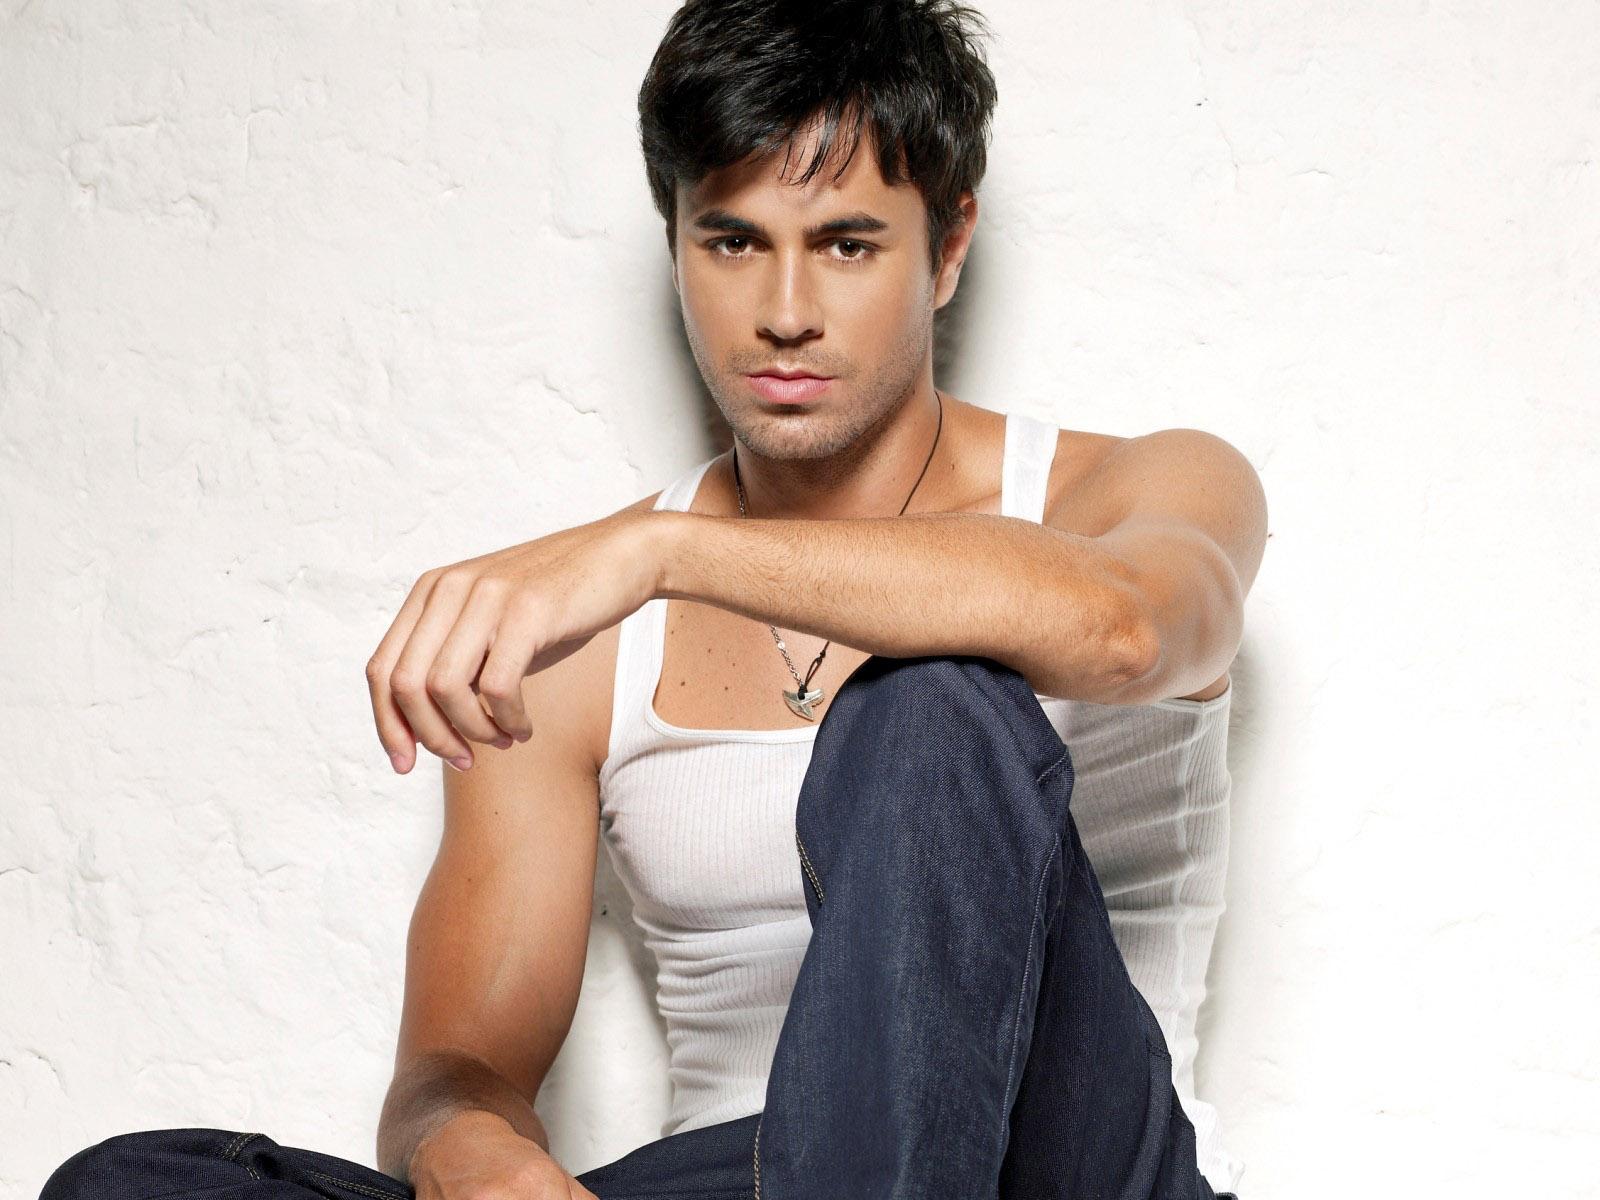 http://4.bp.blogspot.com/_cycniGM-9zw/TAFoVYSb3hI/AAAAAAAAAv8/oYCl24TWTcM/s1600/Enrique_Miguel_Iglesias.jpg